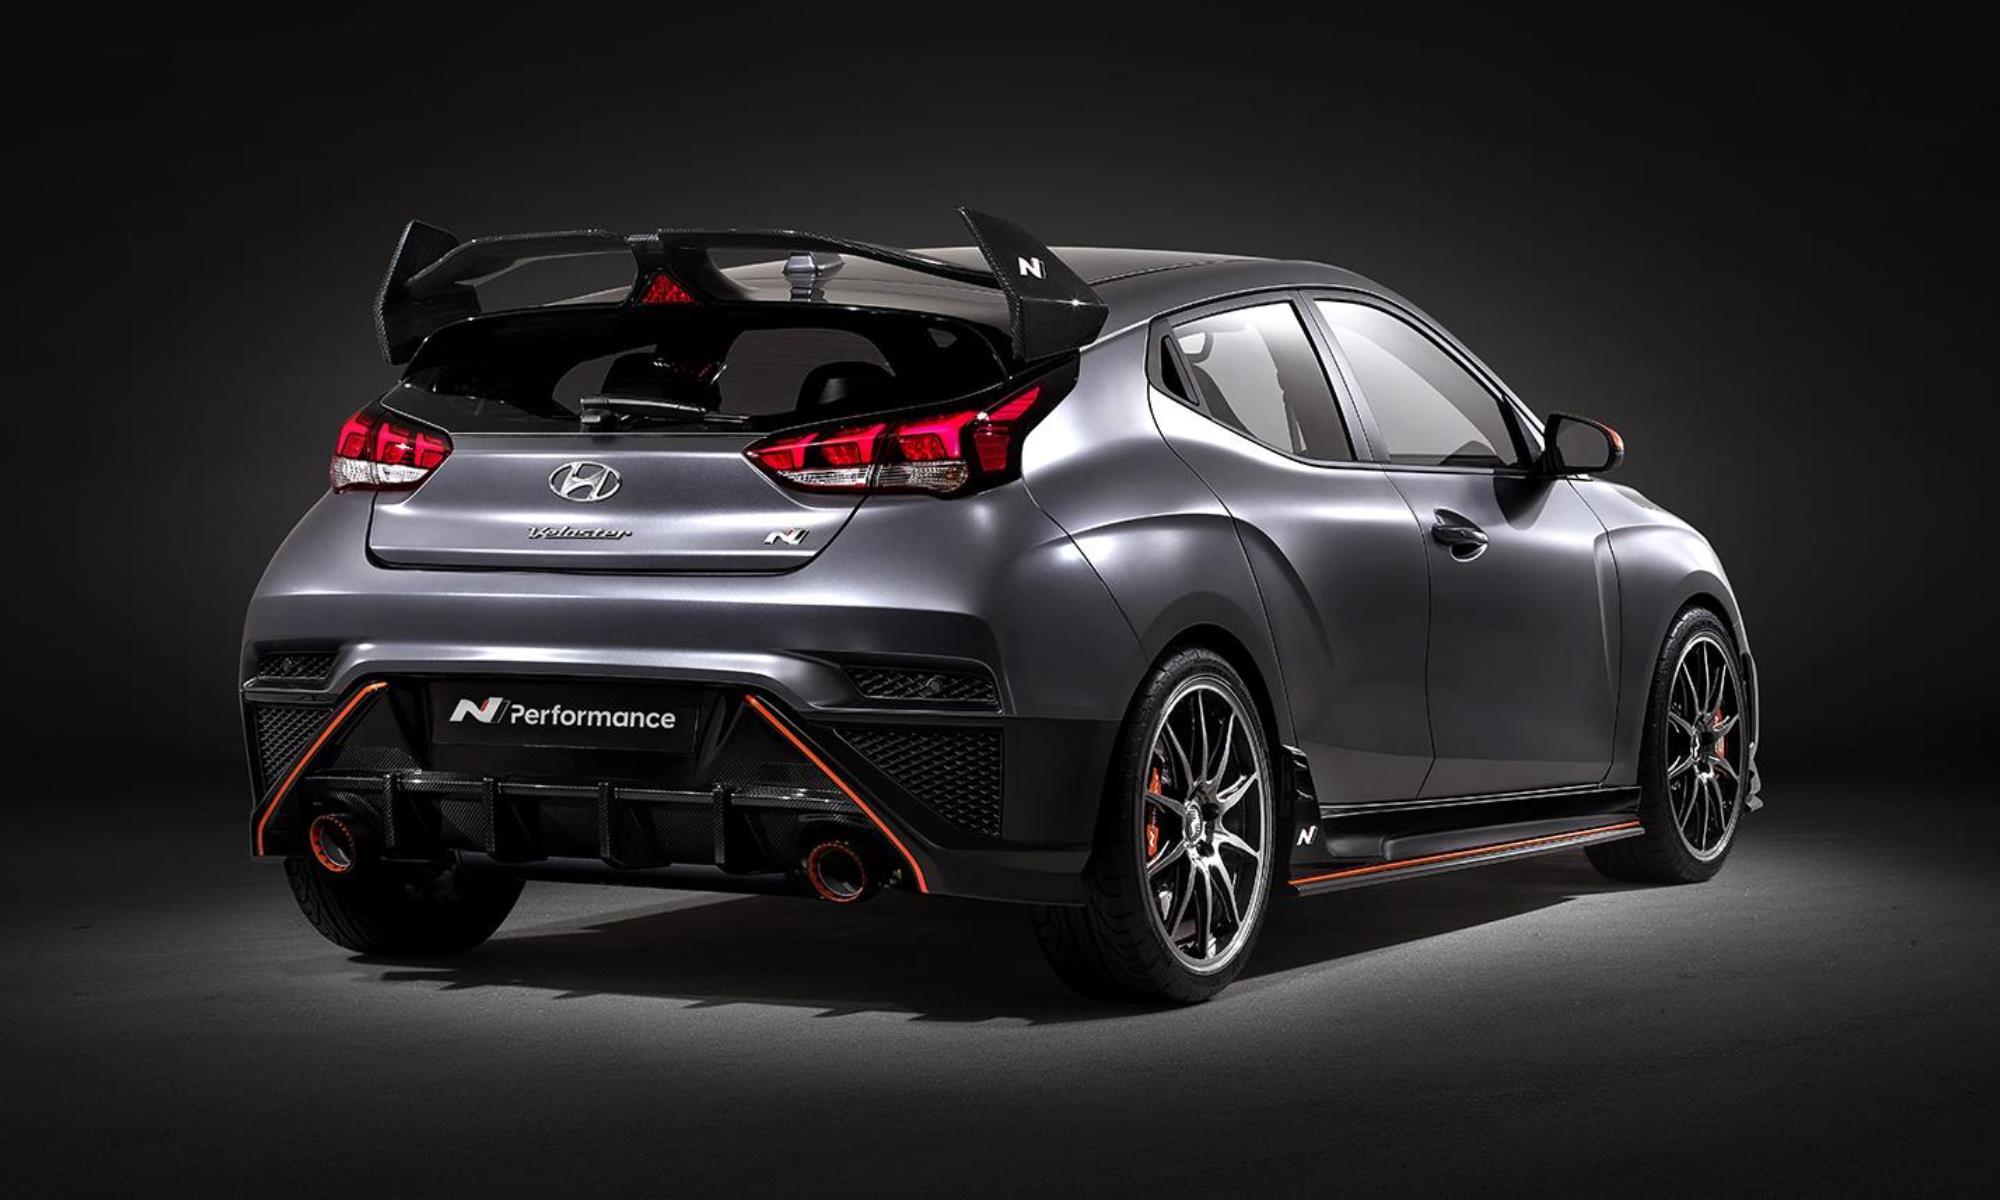 Hyundai Veloster N Performance rear